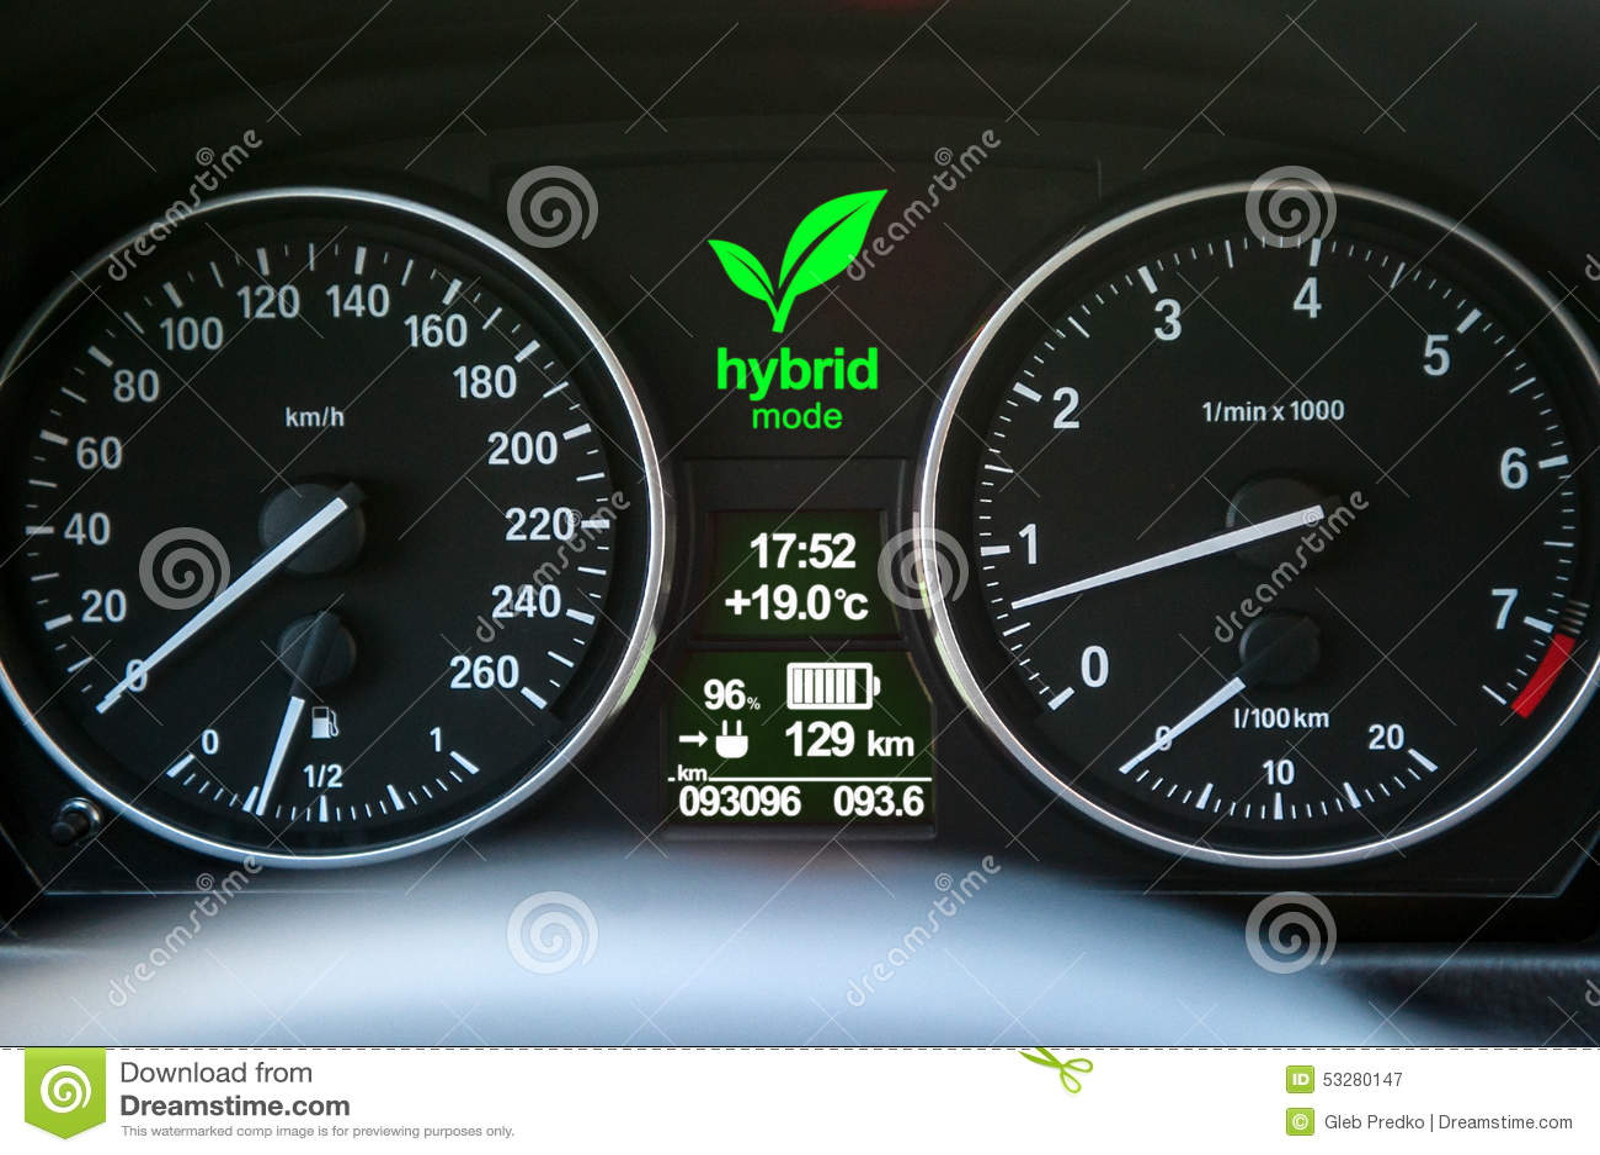 Hybrid Car Dashboard Stock Photo - Image: 53280147